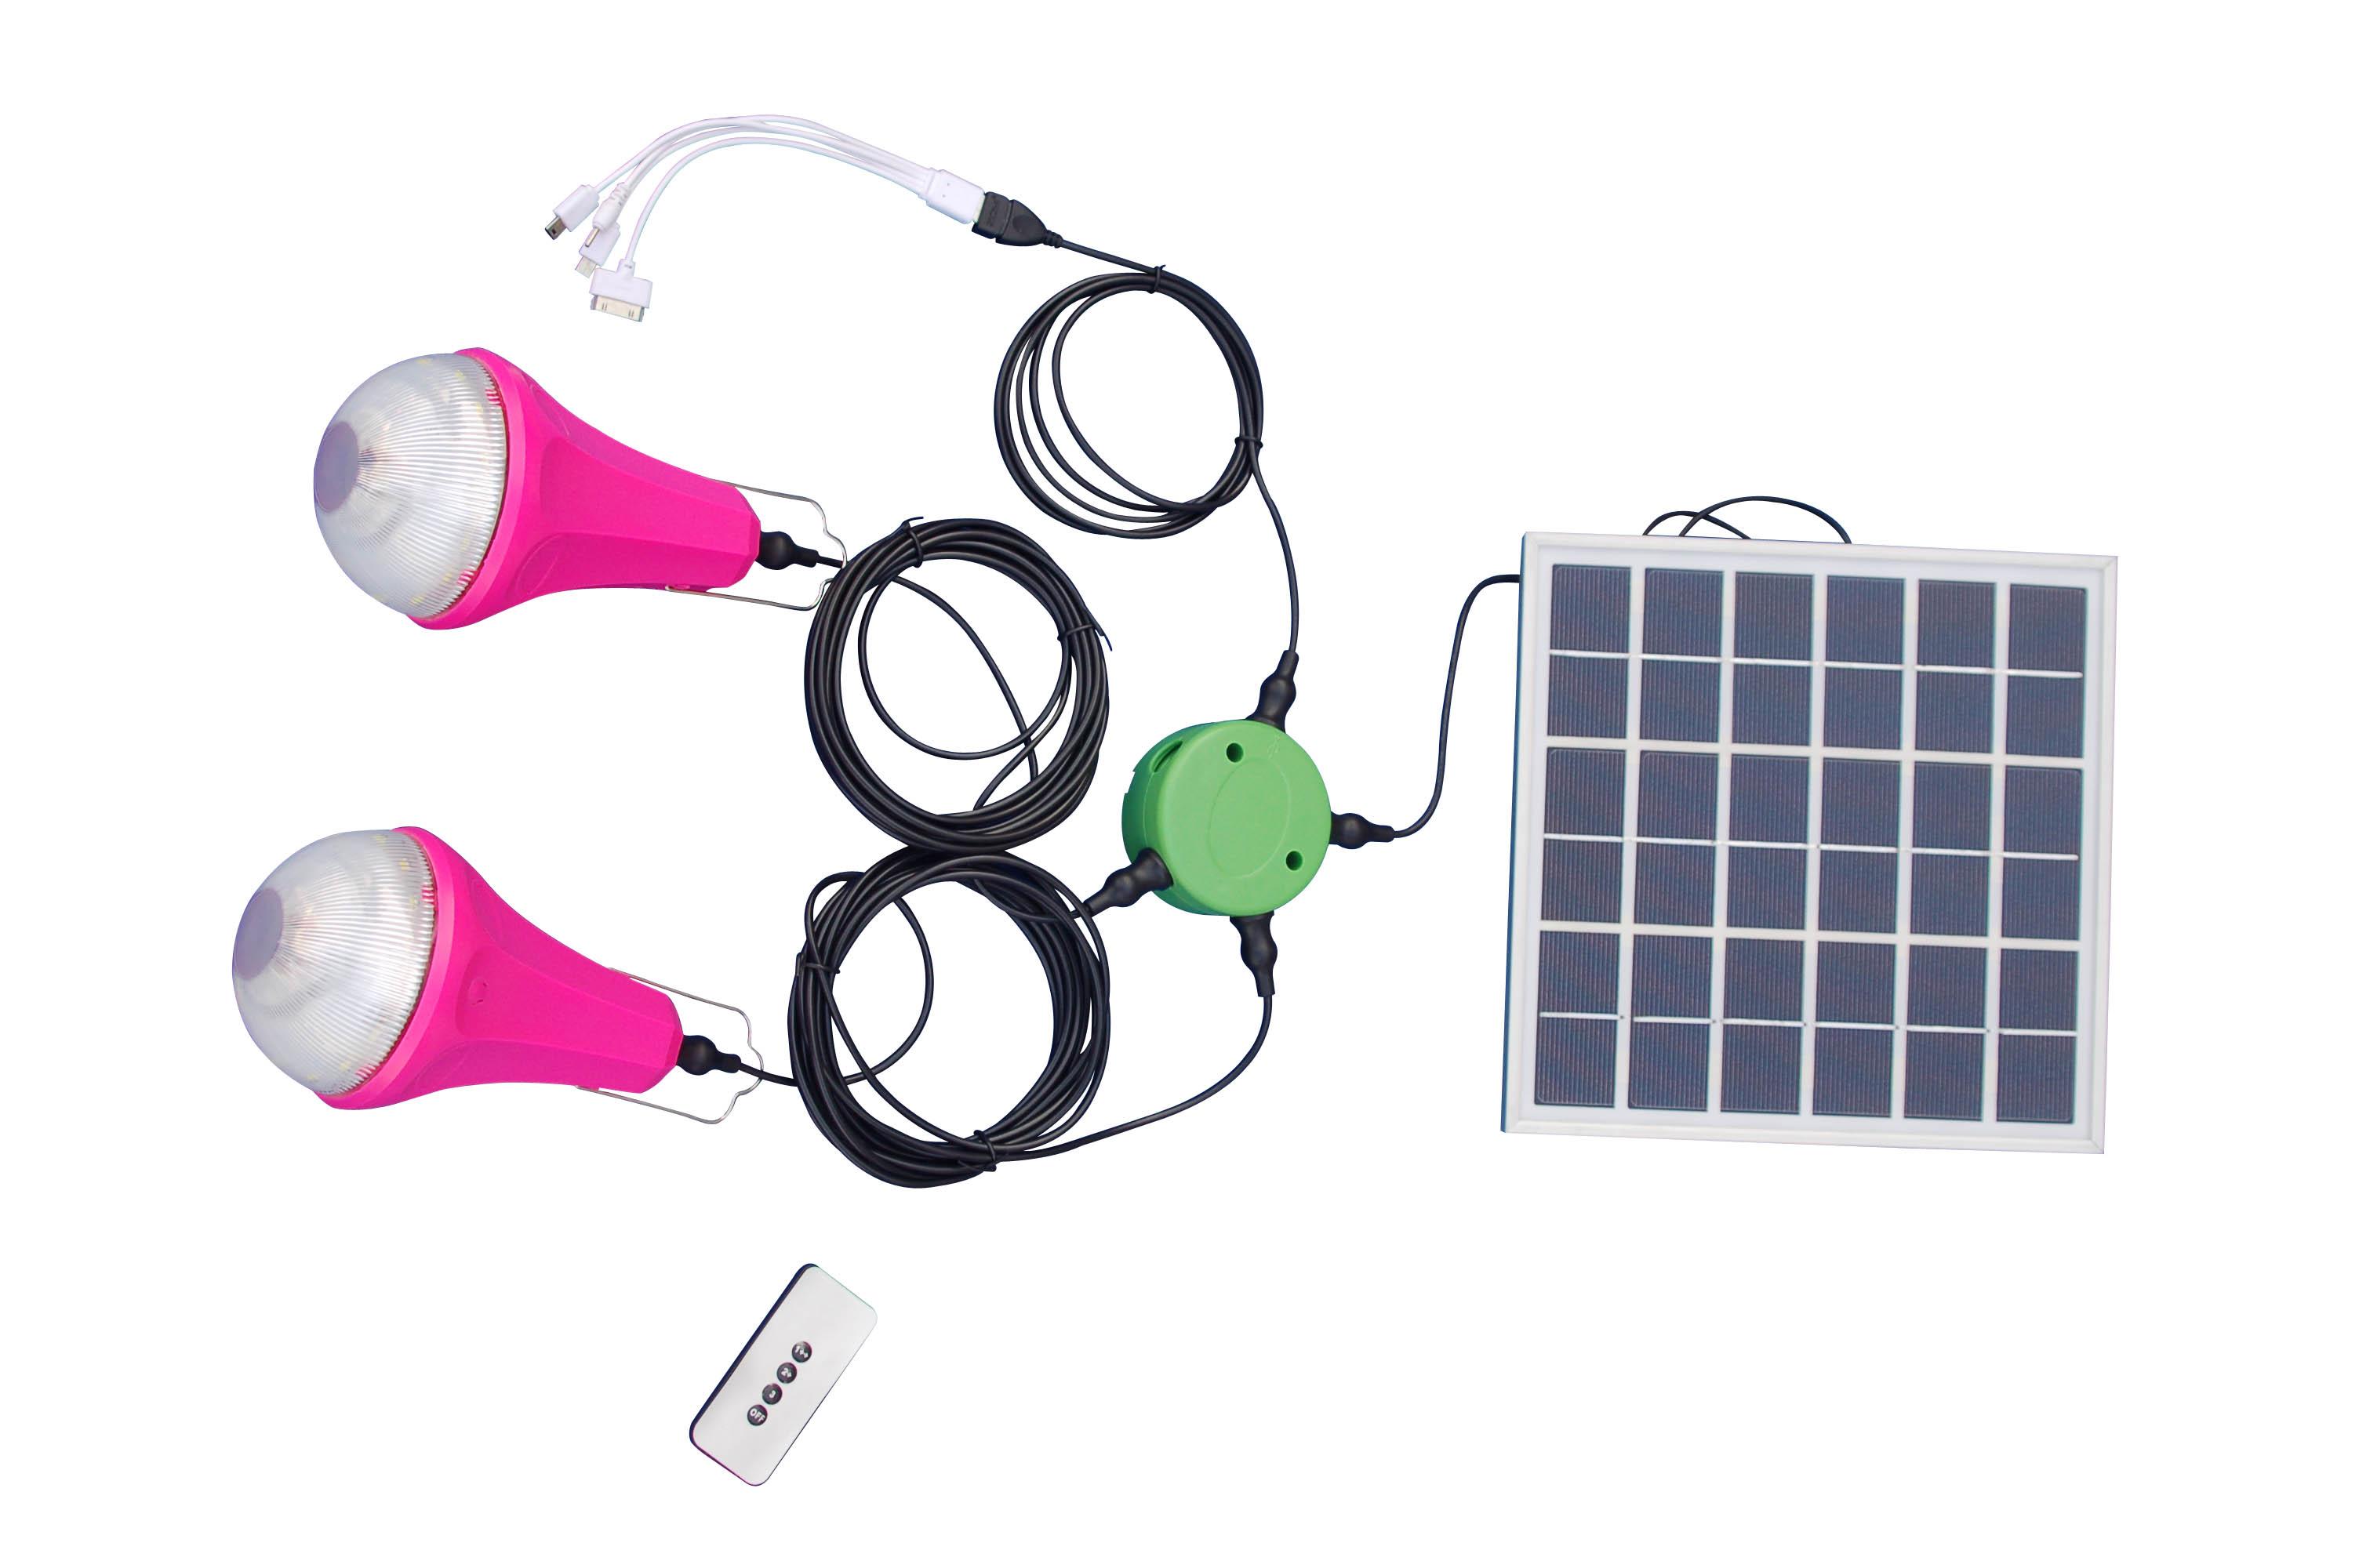 diy太阳能照明小系统